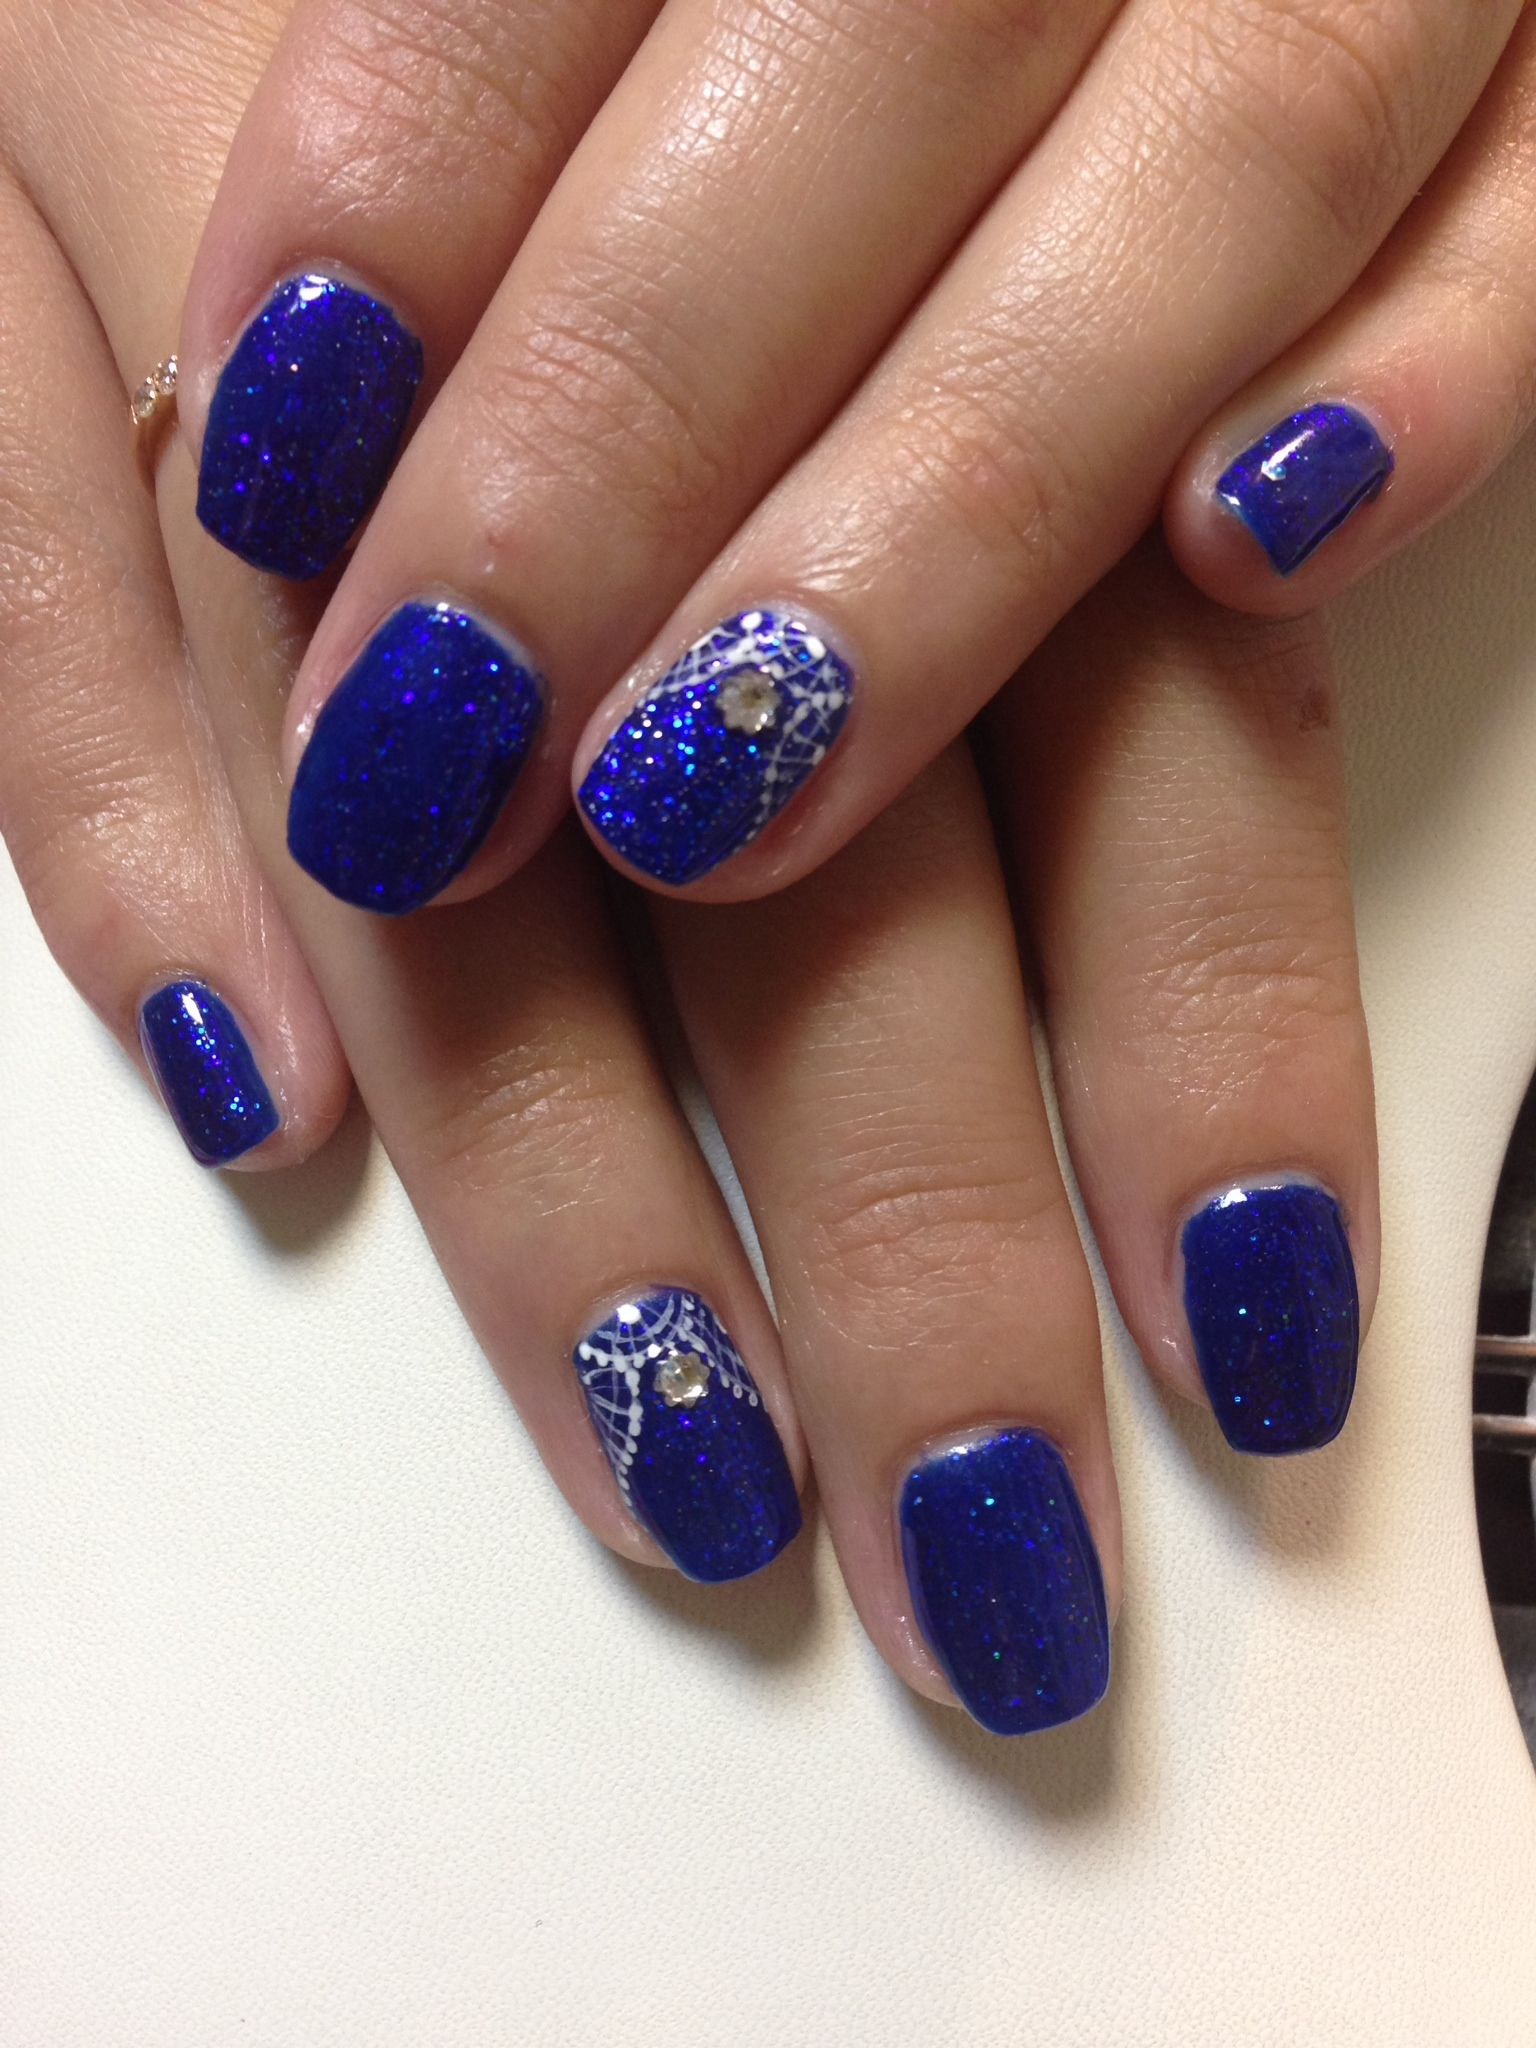 Pin by Пупенко Марианна Викторовна on Работа, my nail art, nail gel ...